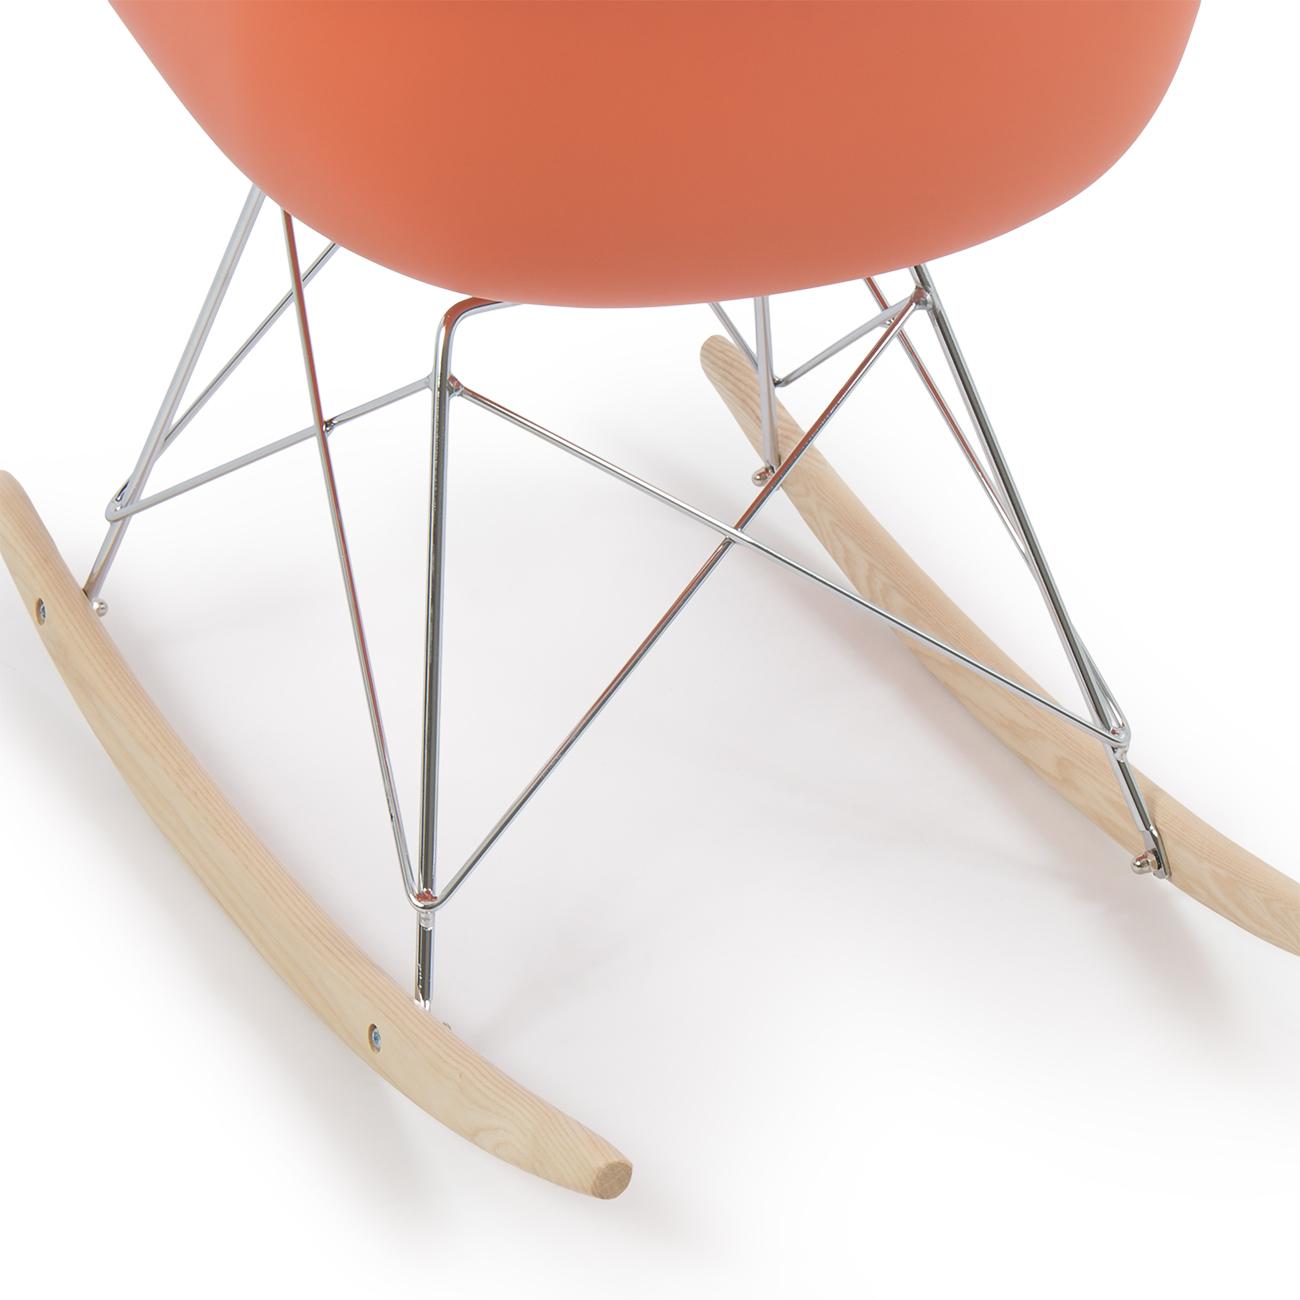 eames rocking chair black leather dining chairs retro dsw style modern arm rar rocker